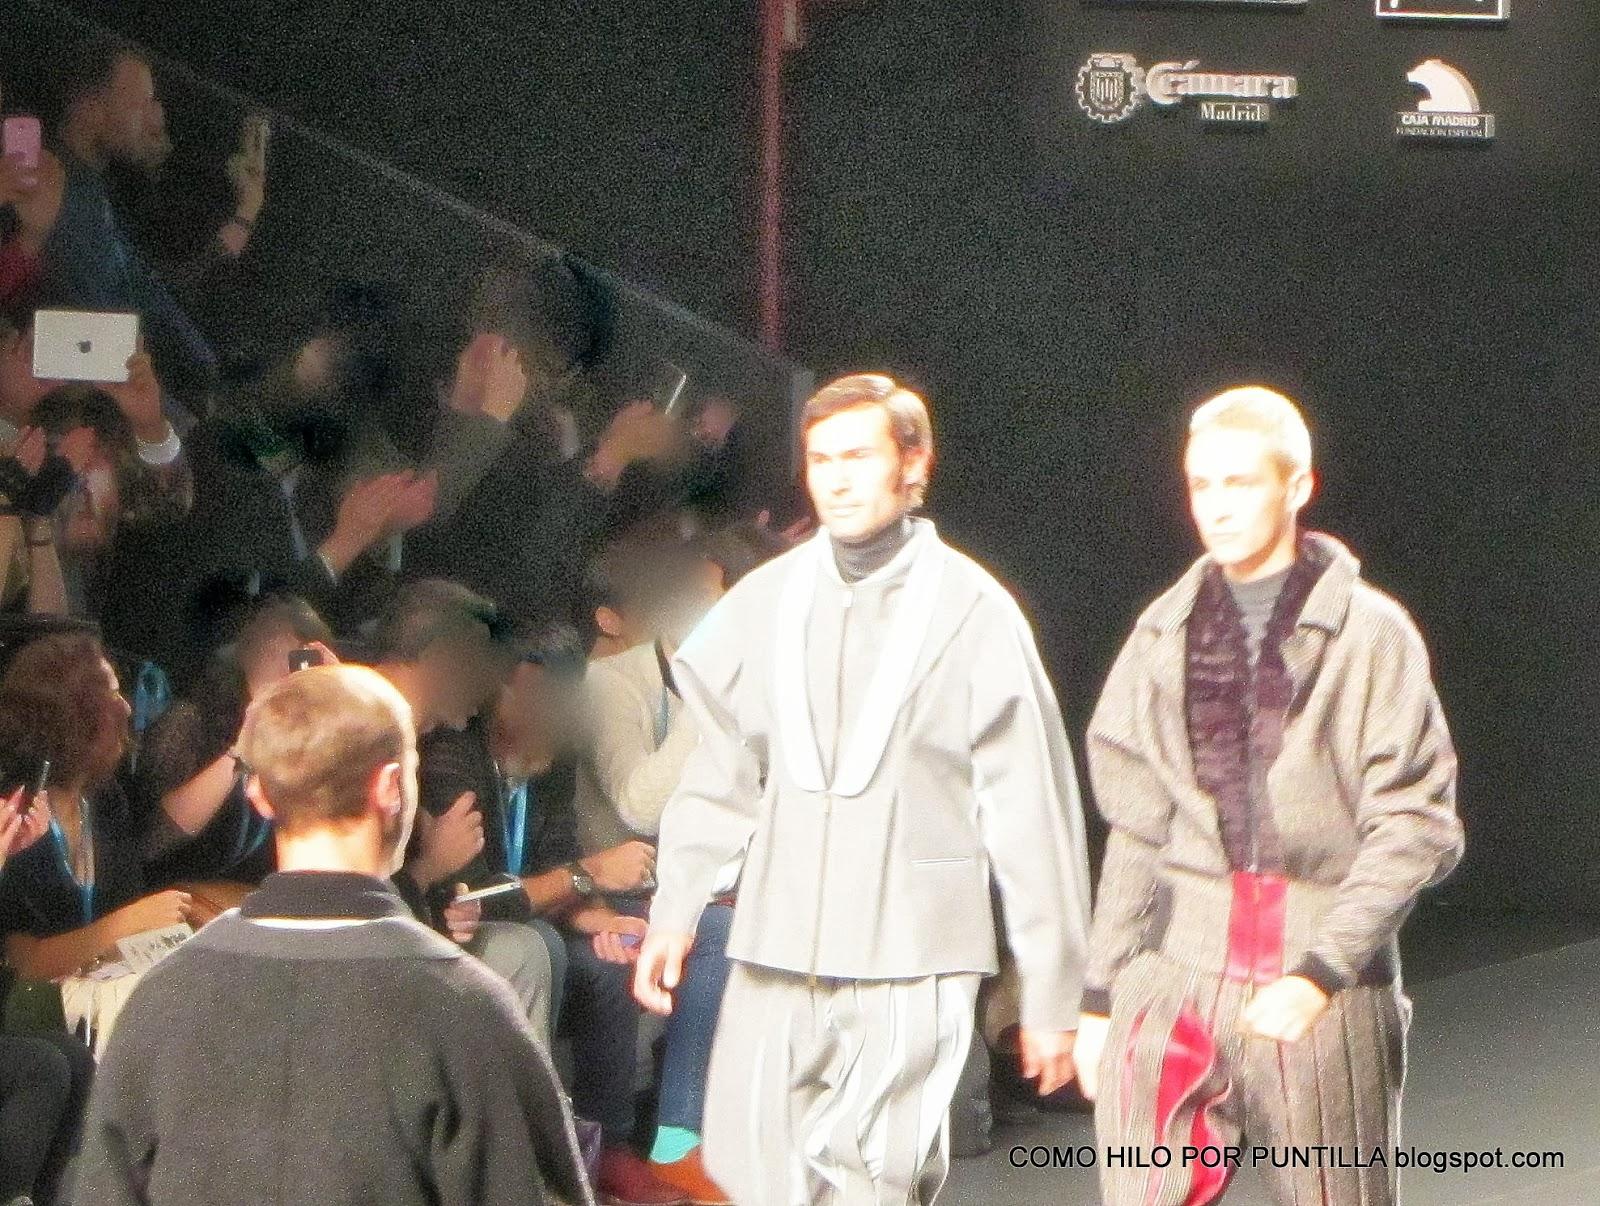 Mercedes-Benz-Fashion-Week-Madrid-Etxeberría